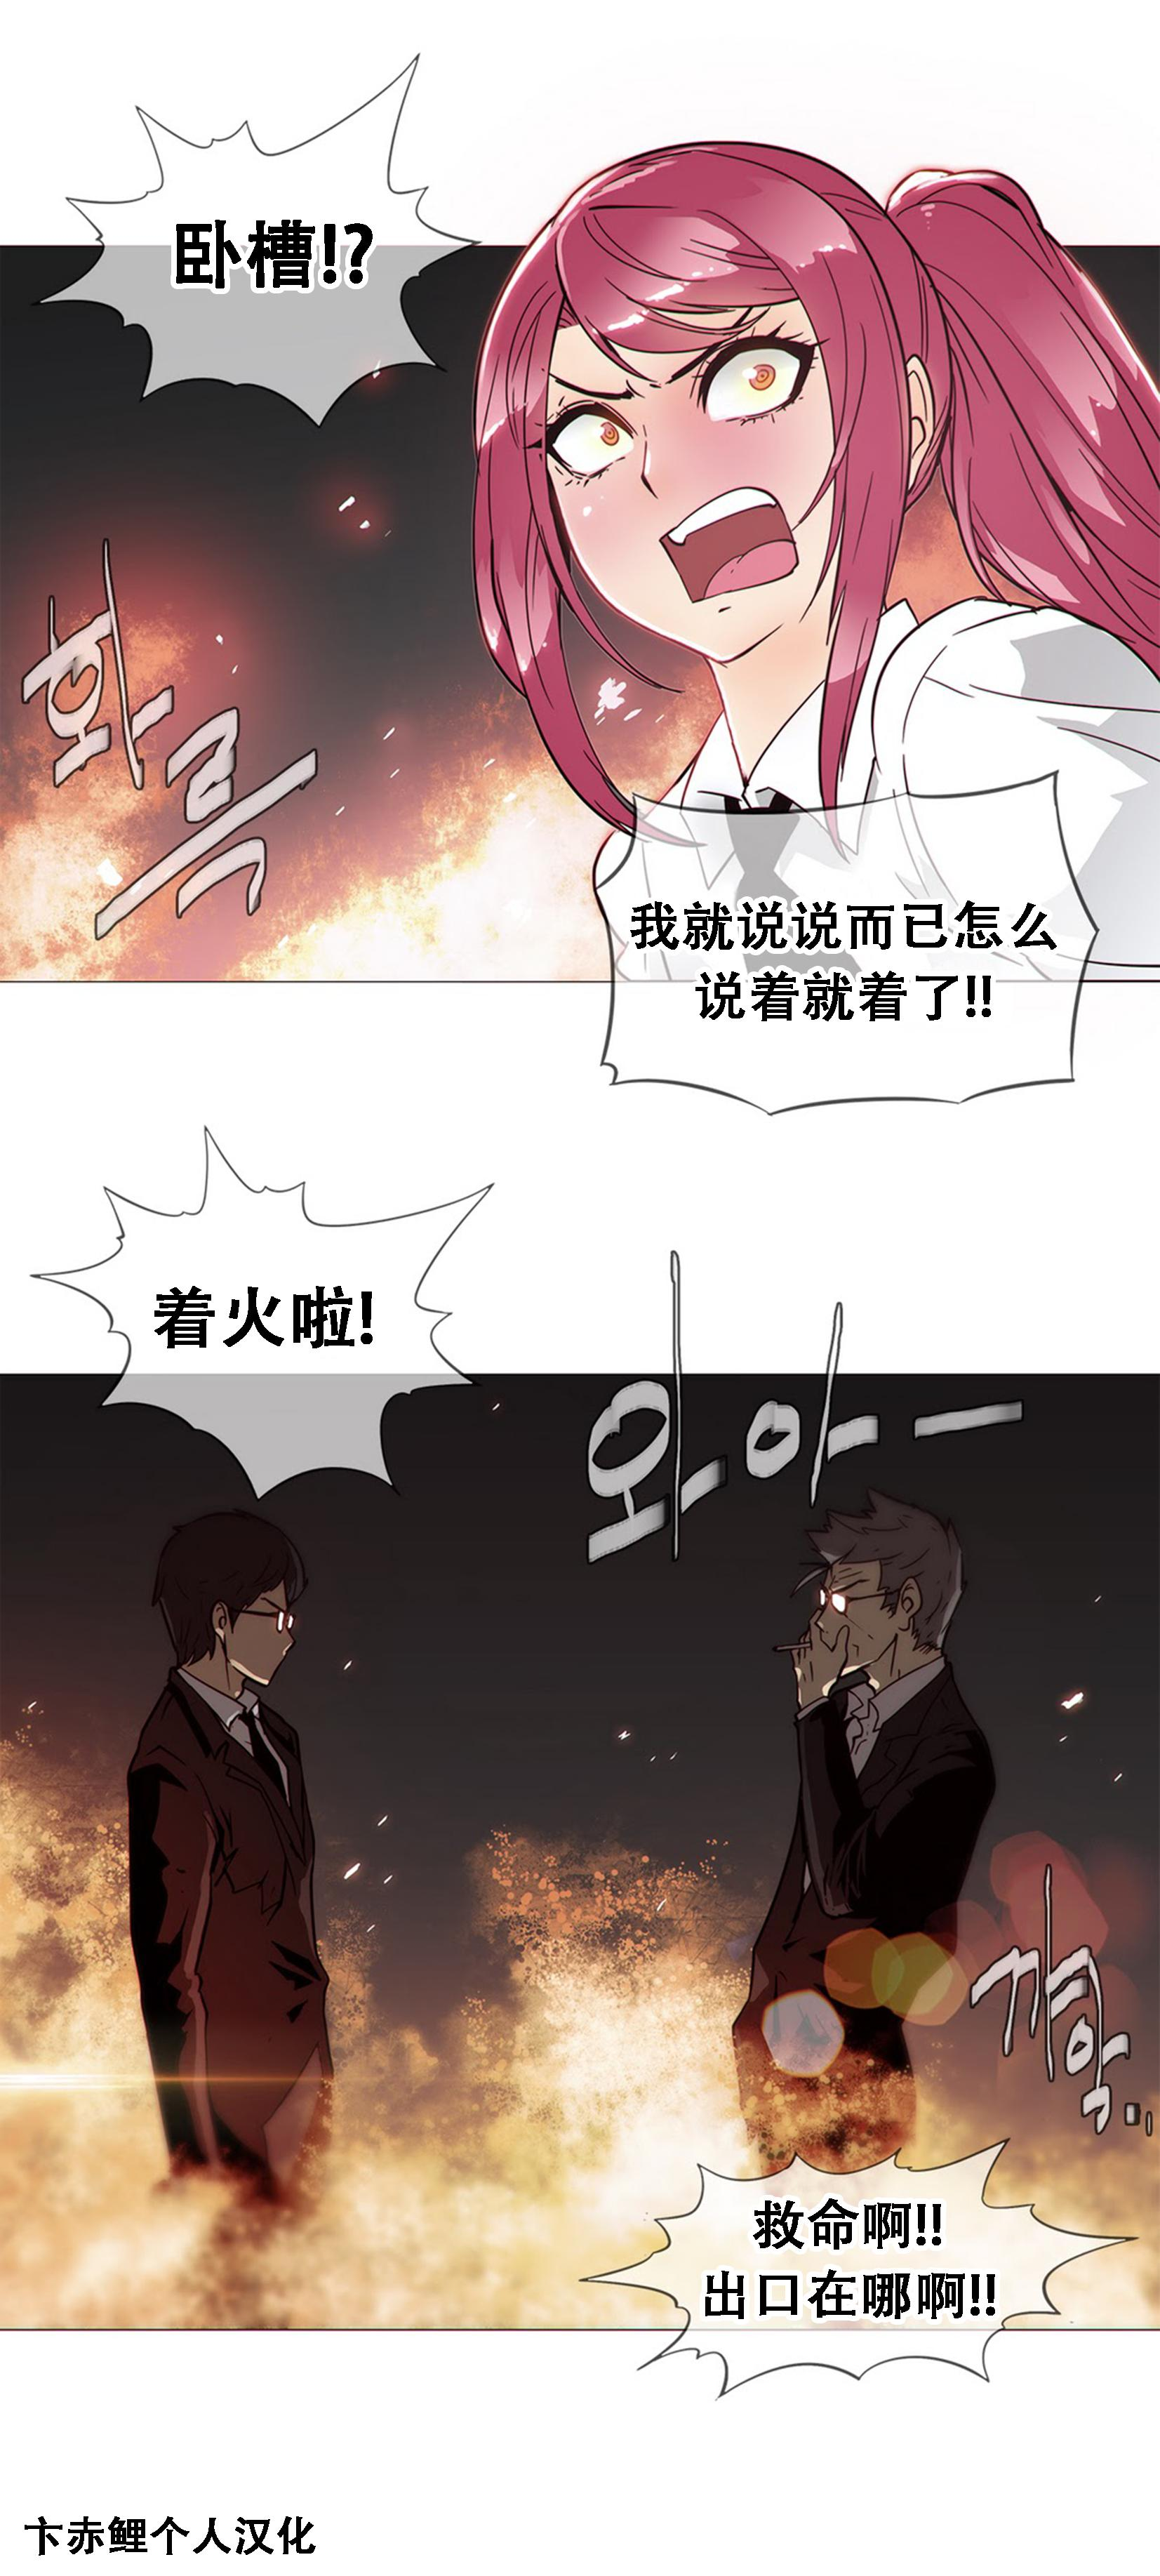 HouseHold Affairs 【卞赤鲤个人汉化】1~21话(持续更新中) 368